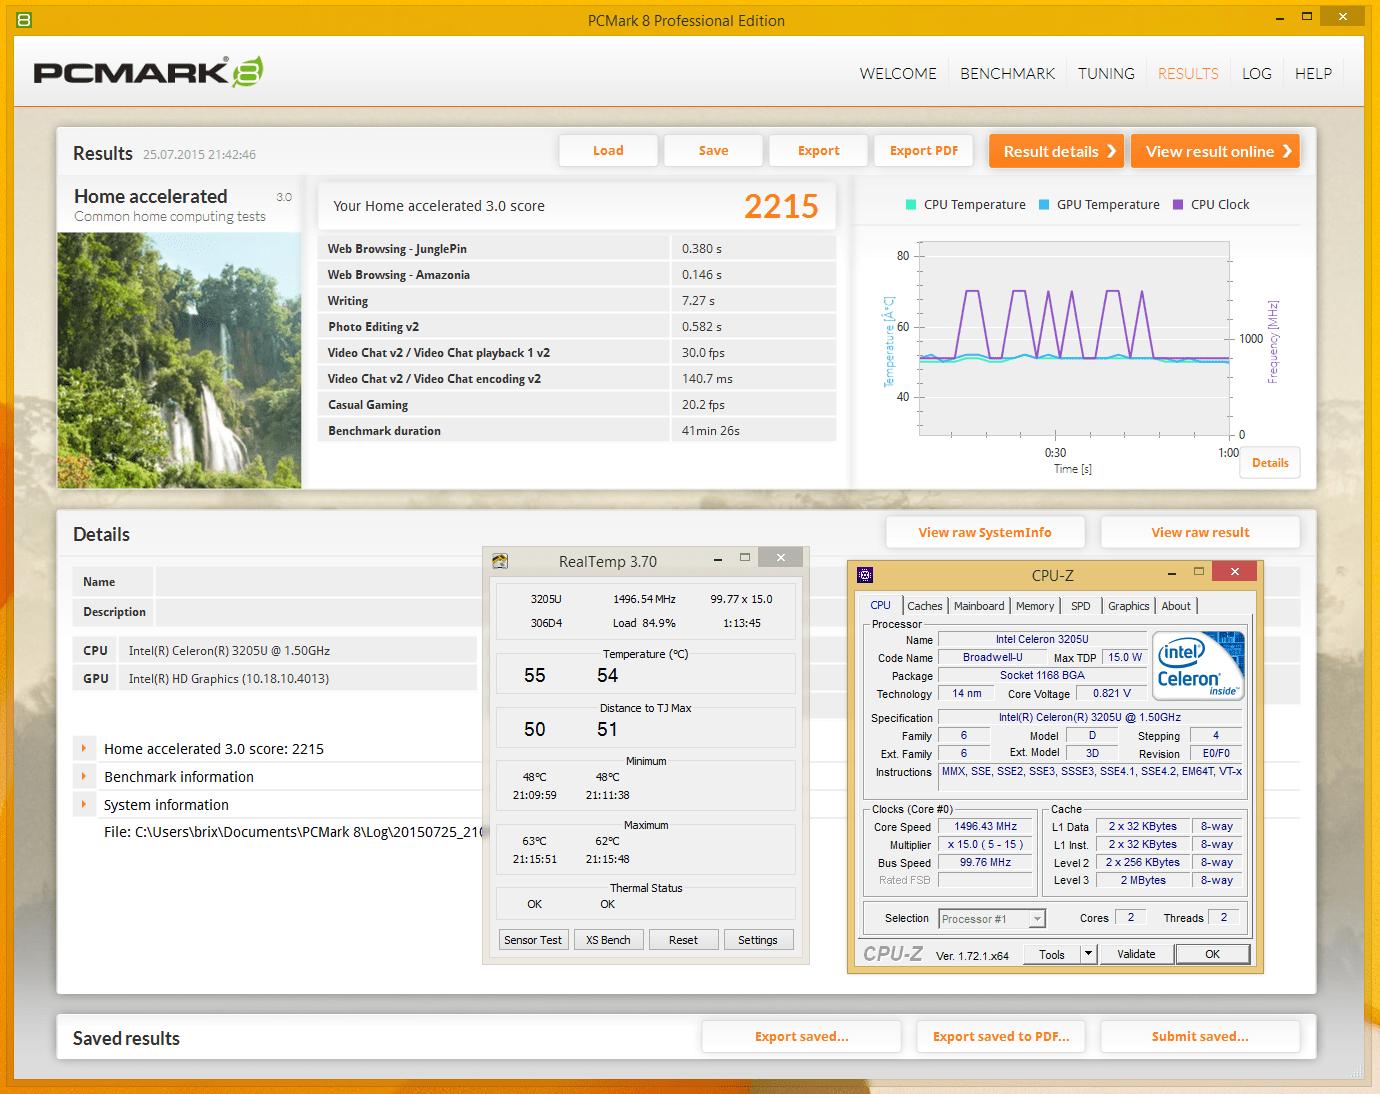 pcmark realtemp